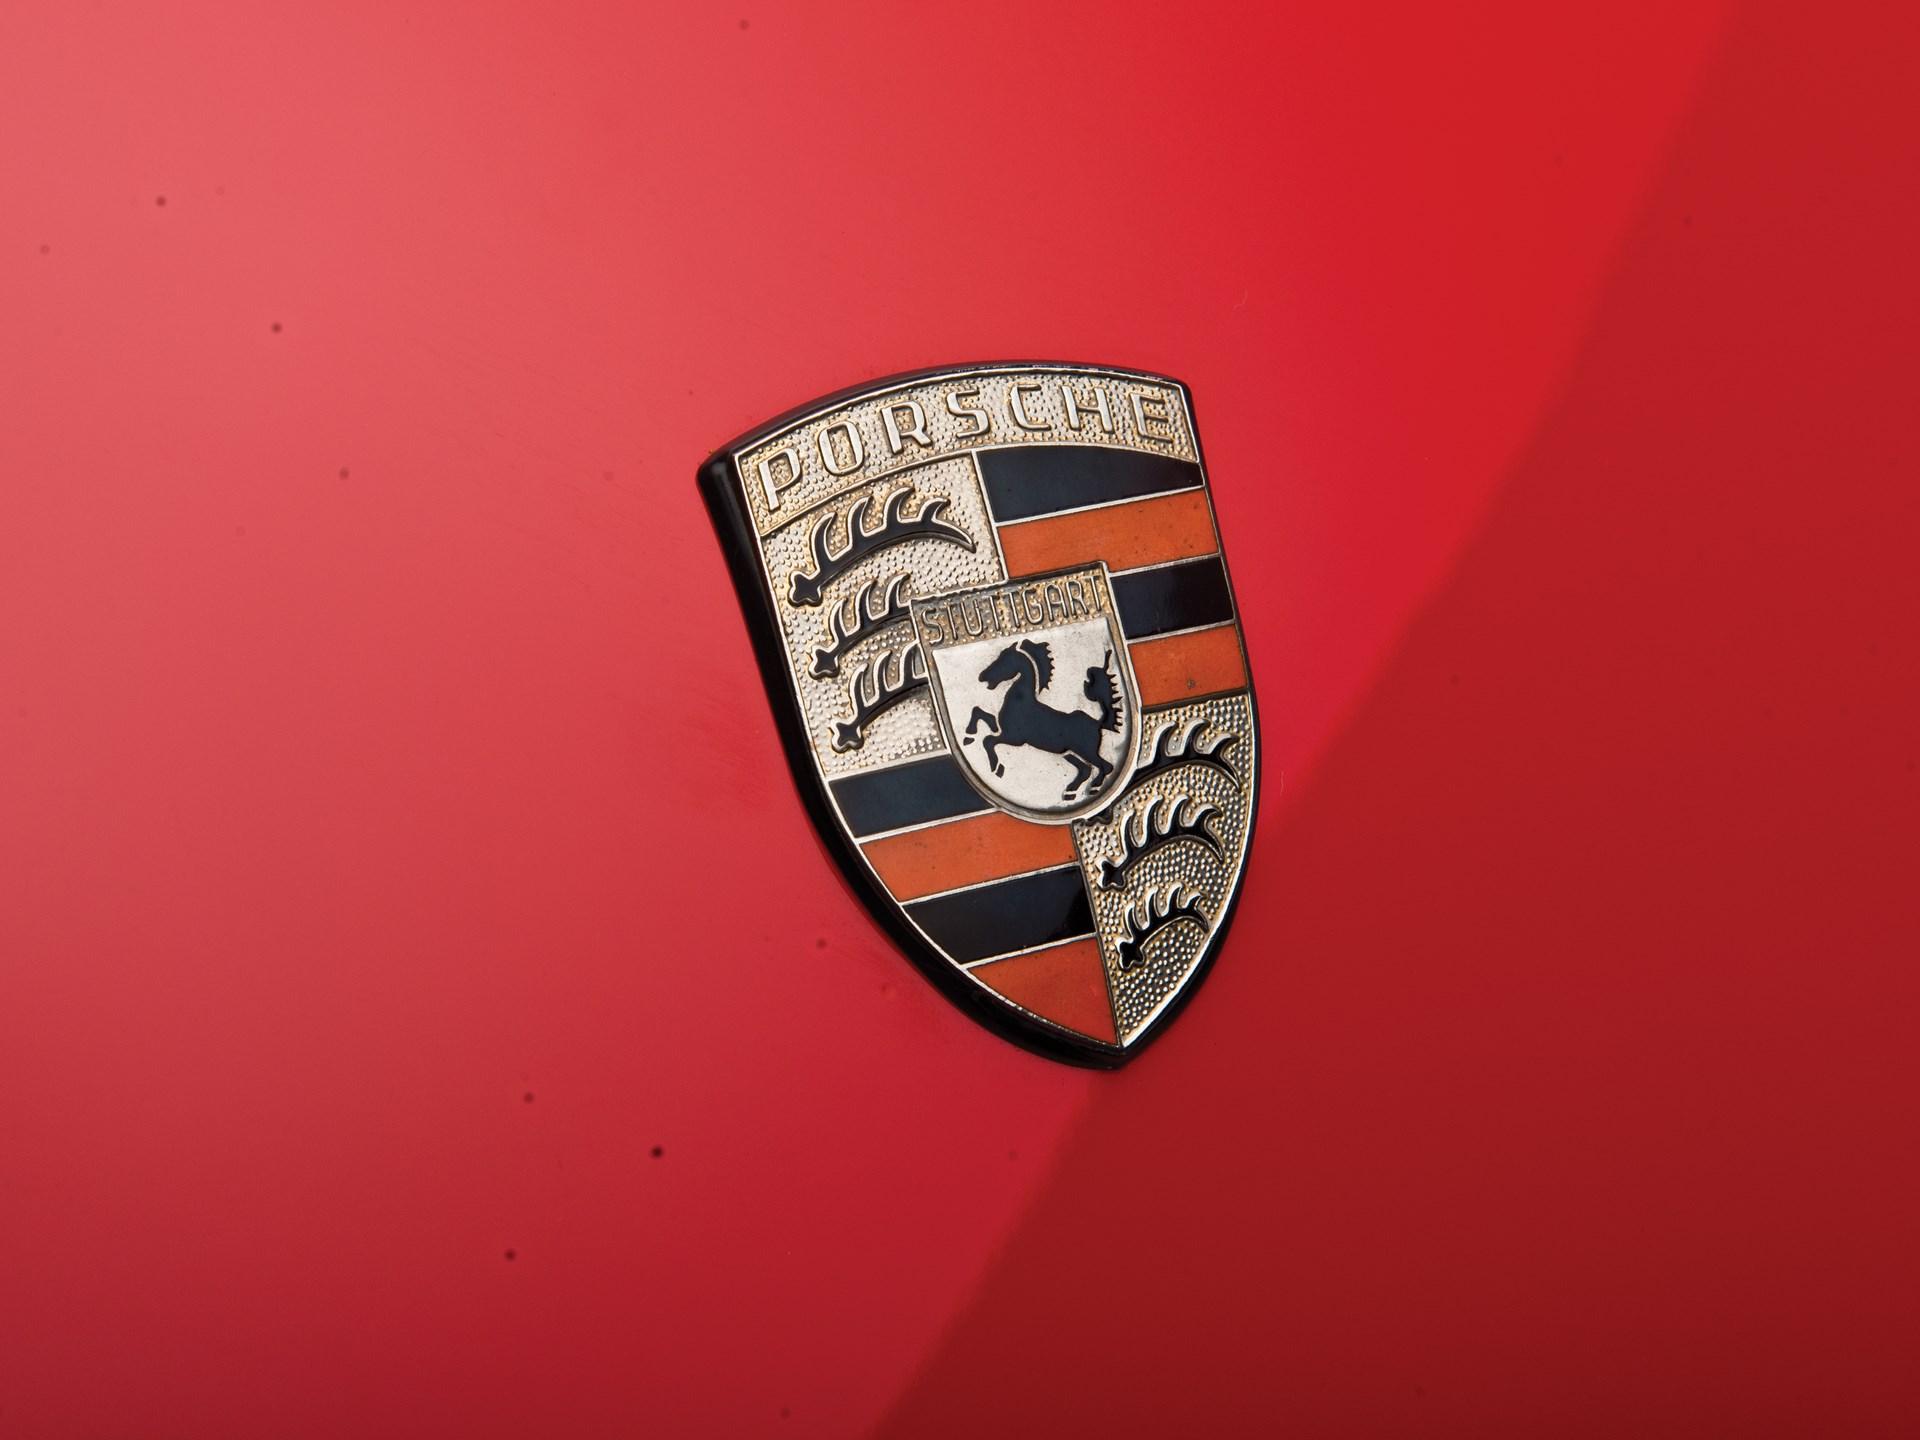 1973 Porsche 911 Carrera RS Touring